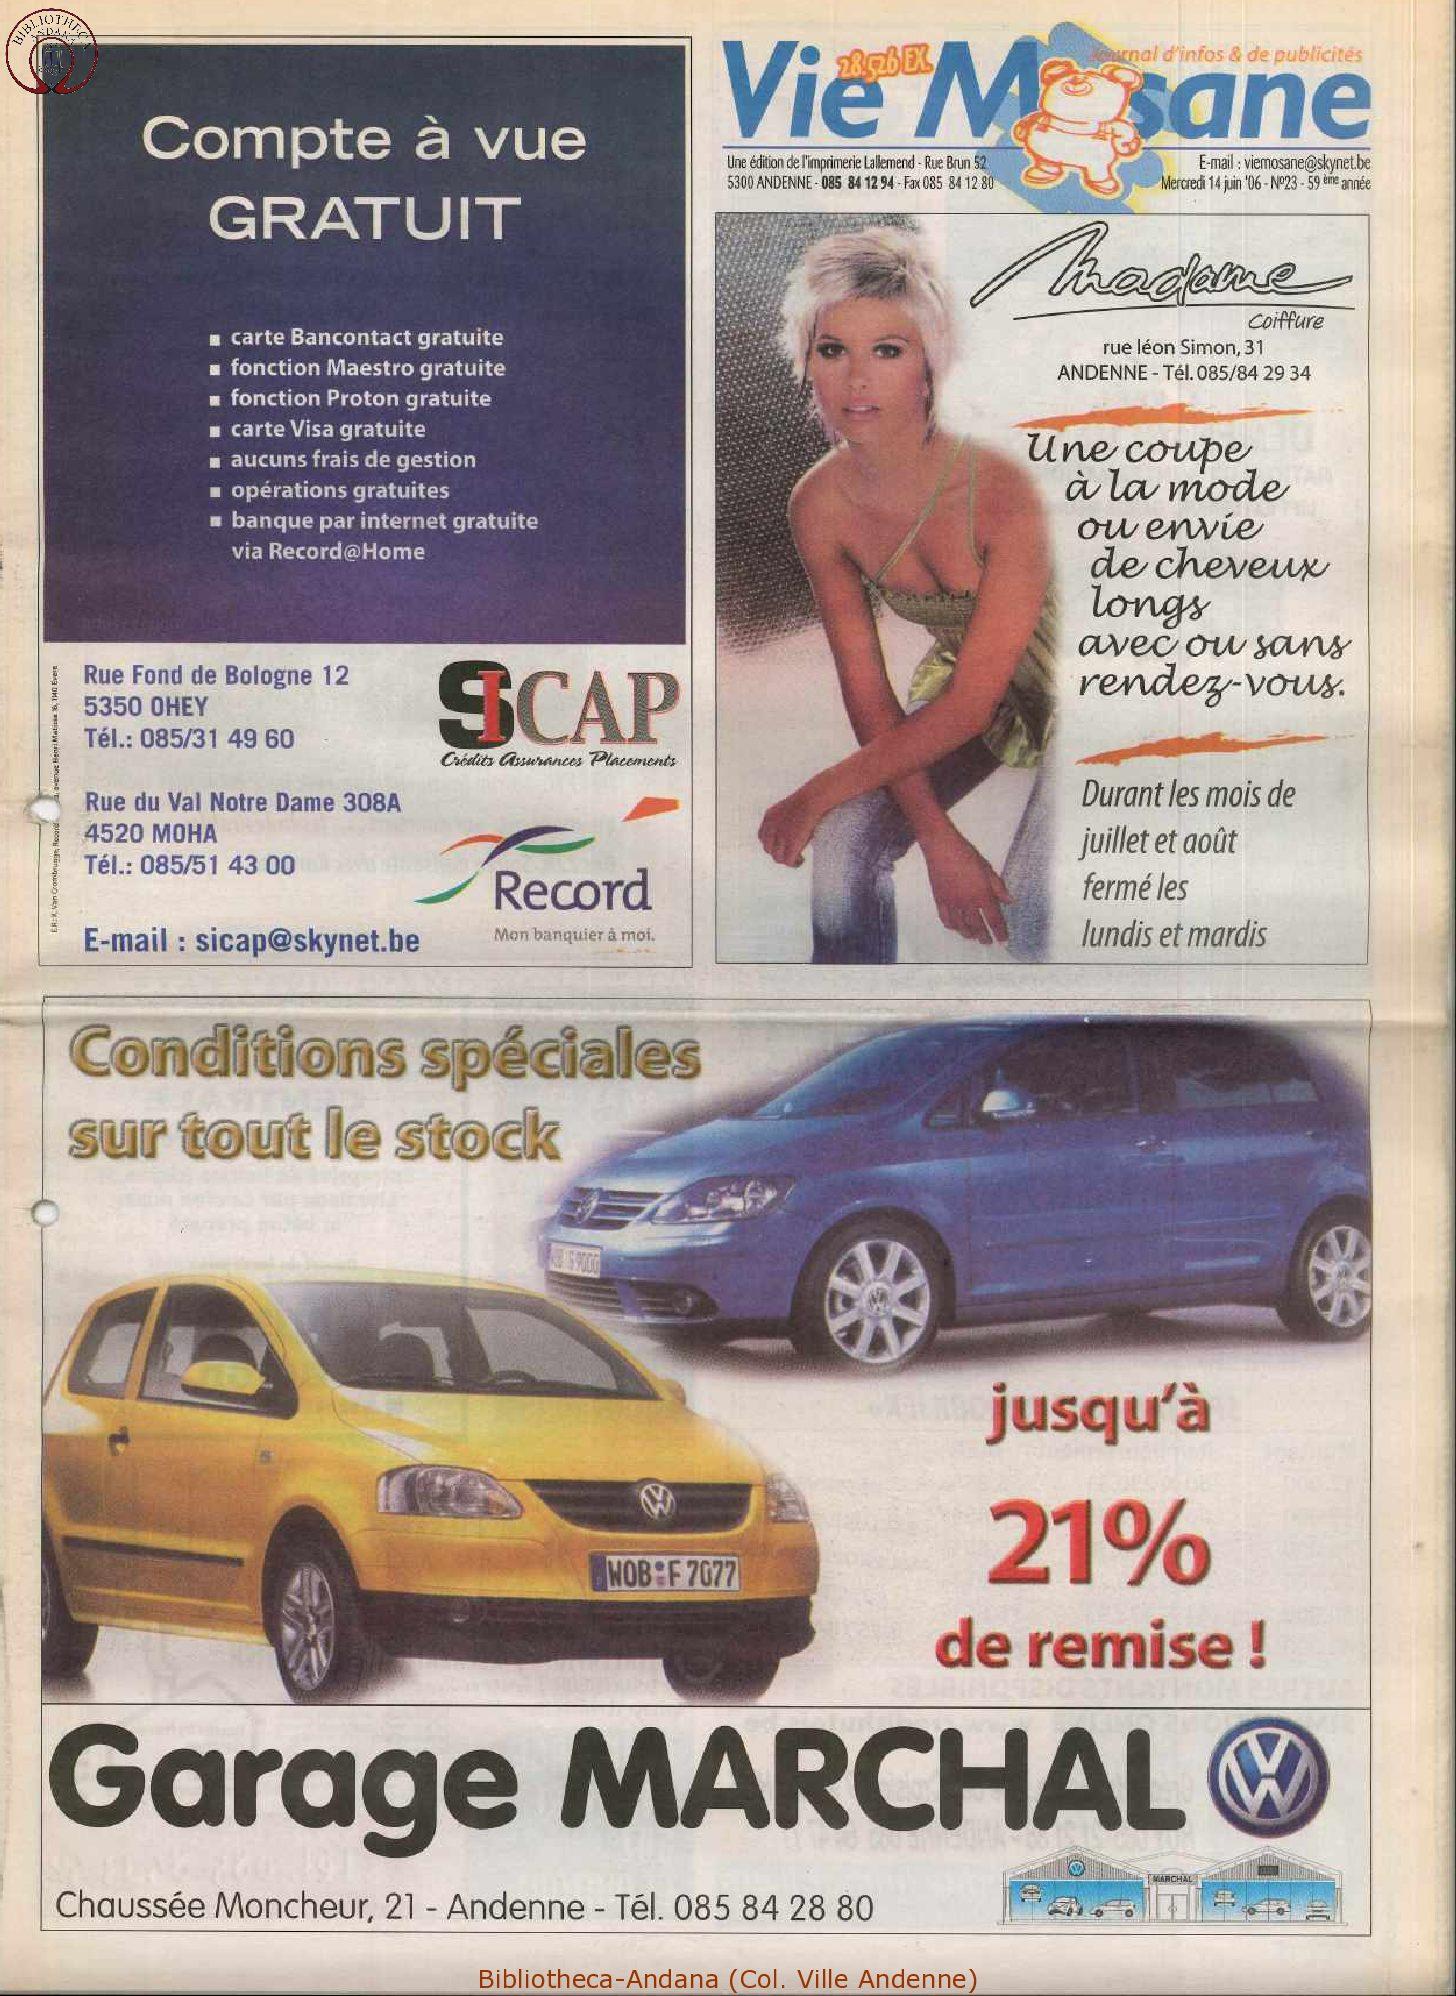 59e année - n°23 - 14 juin 2006